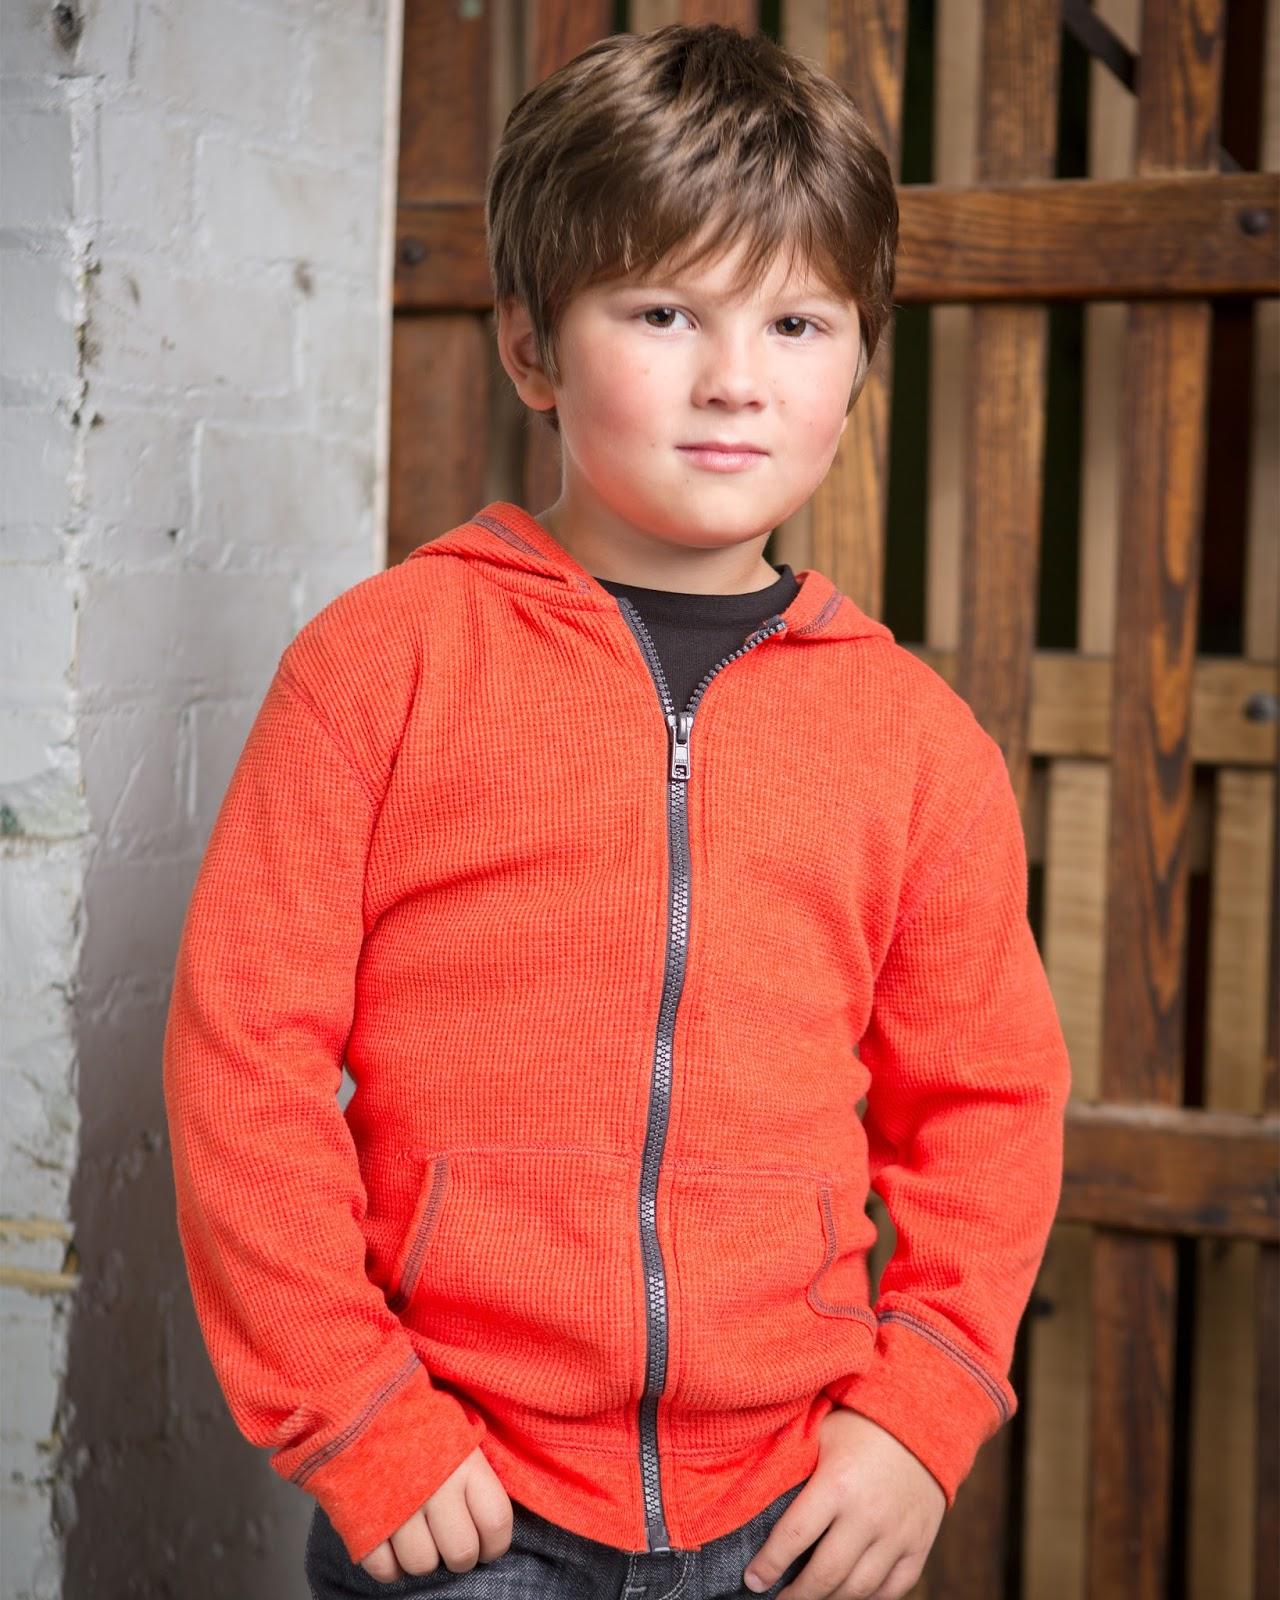 Brody Bover